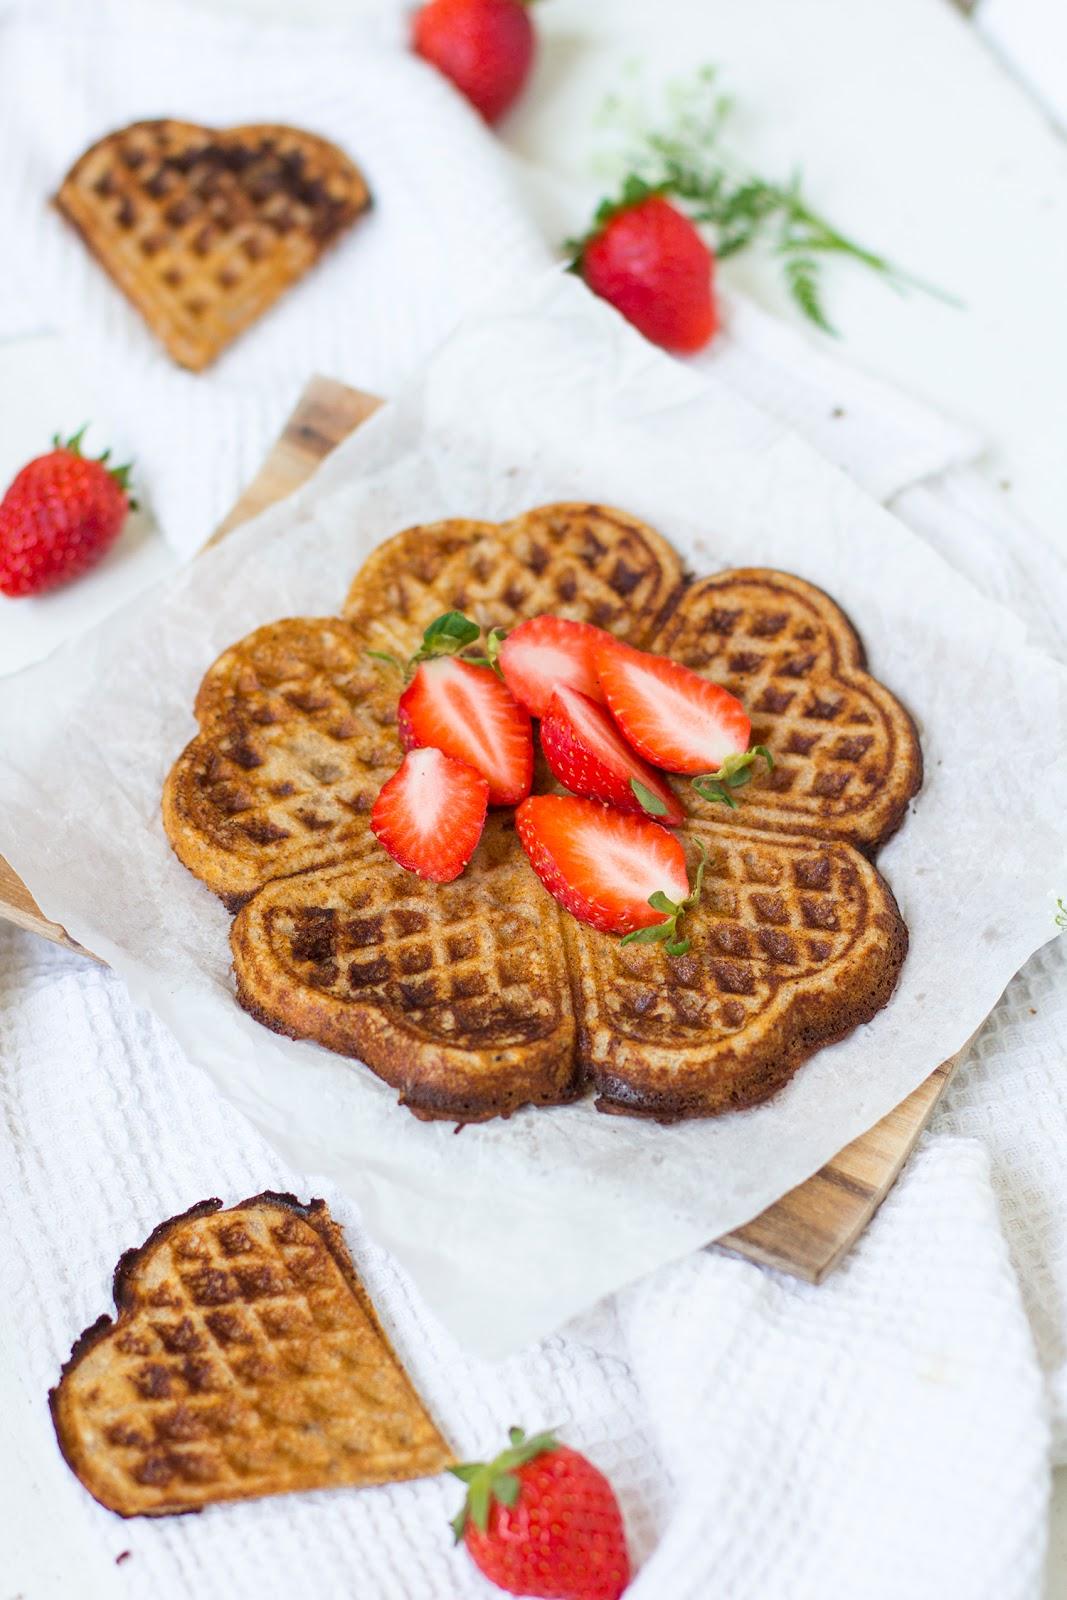 vegan gluten free waffle recipe